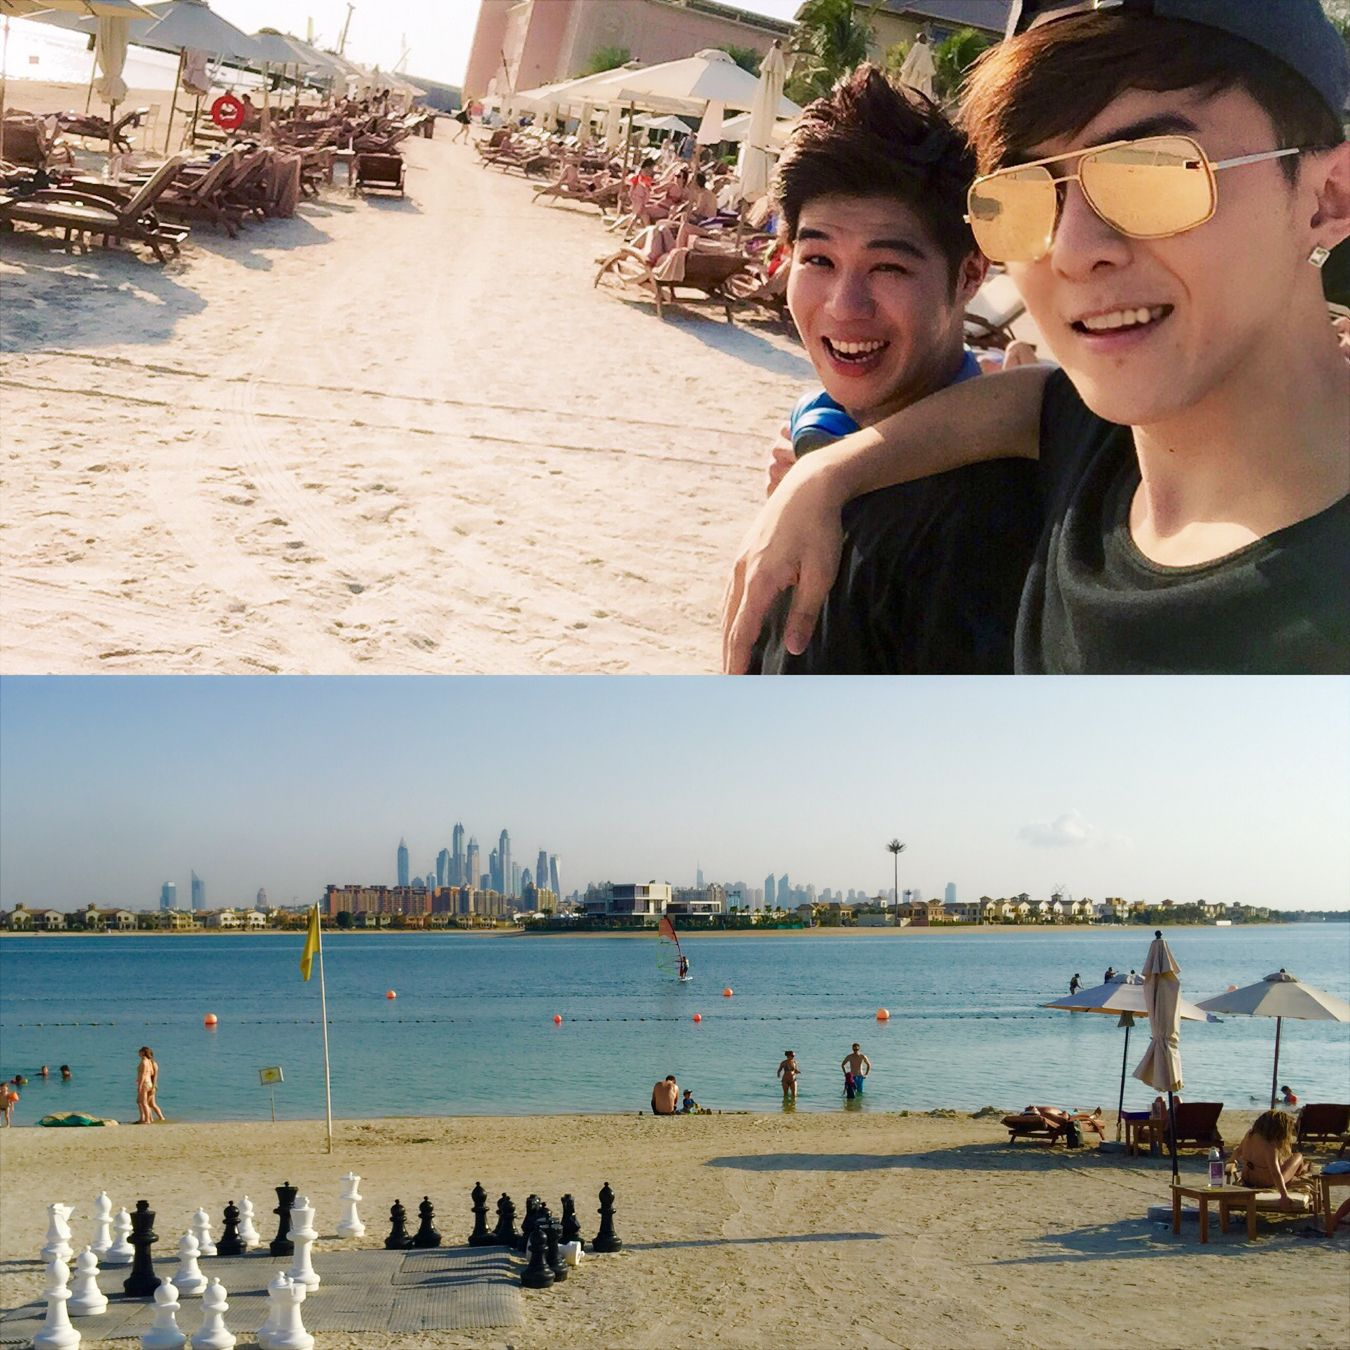 棕櫚島上的沙灘,脫衣服吧! DT 唐禹哲 Dubai Danson tang, Tang, Kpop